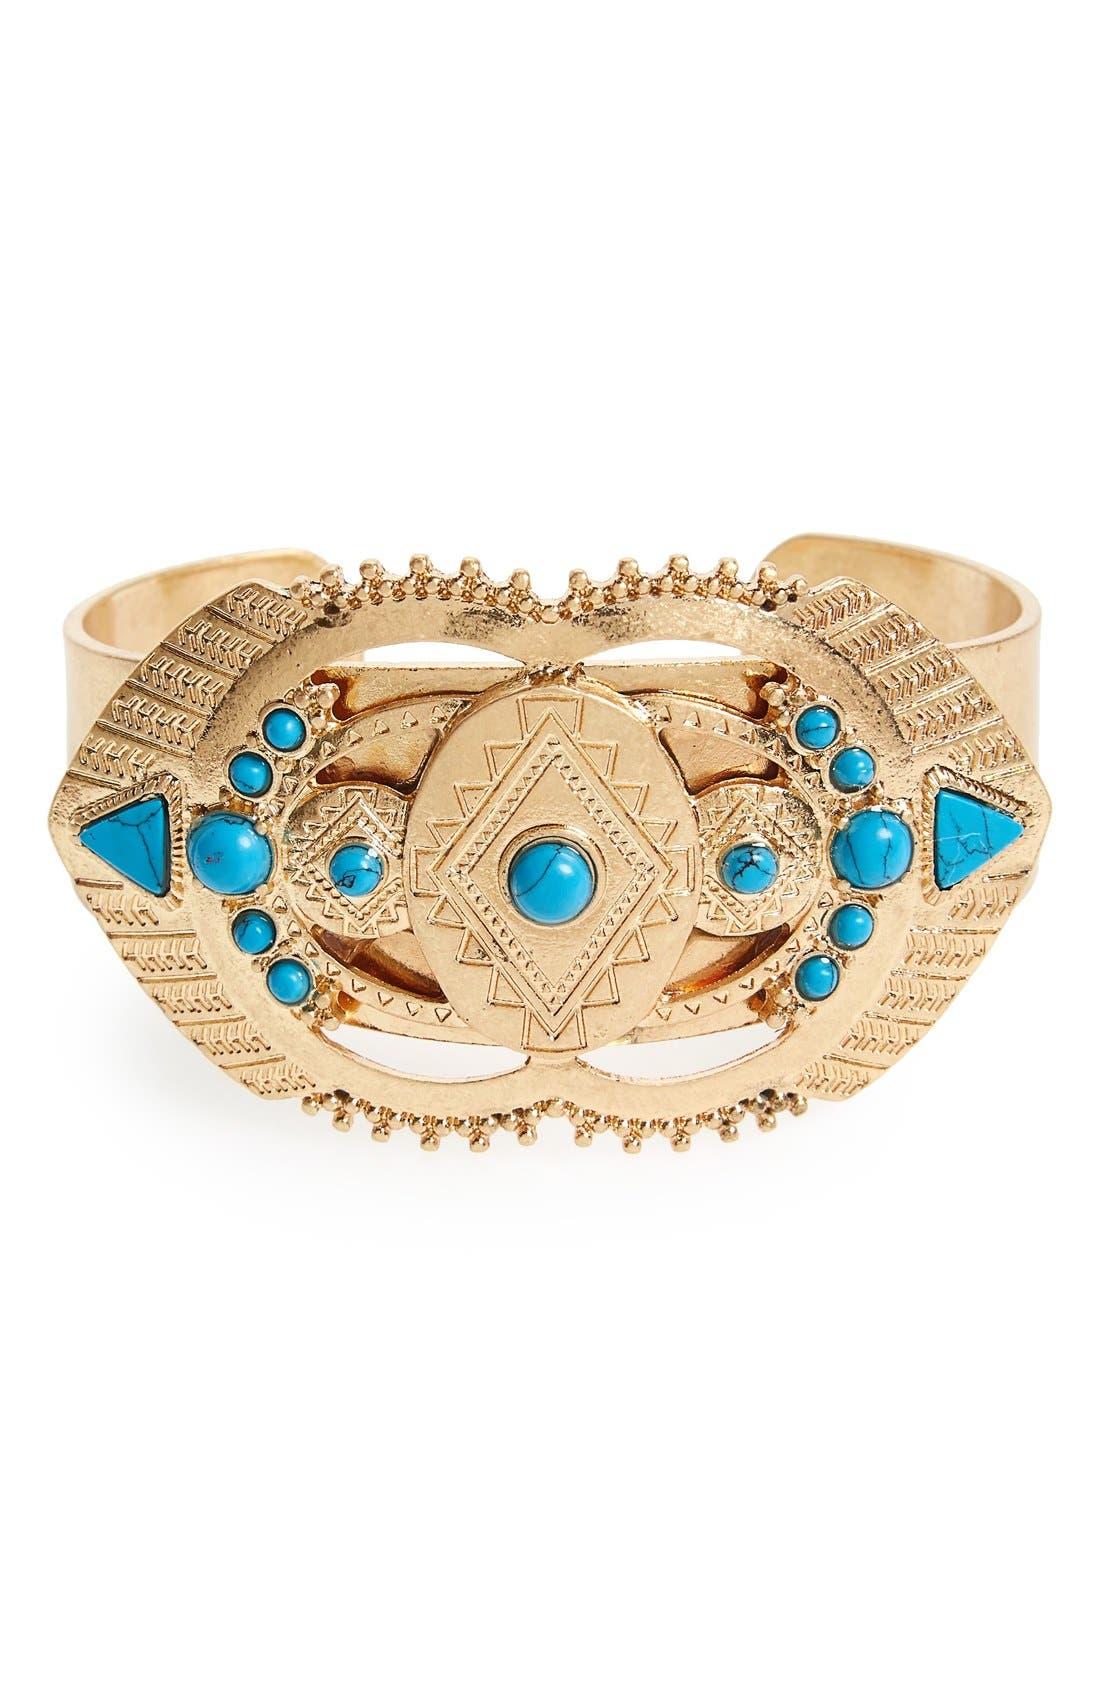 Alternate Image 1 Selected - Danielle Nicole 'Dream' Reconstituted Turquoise Cuff